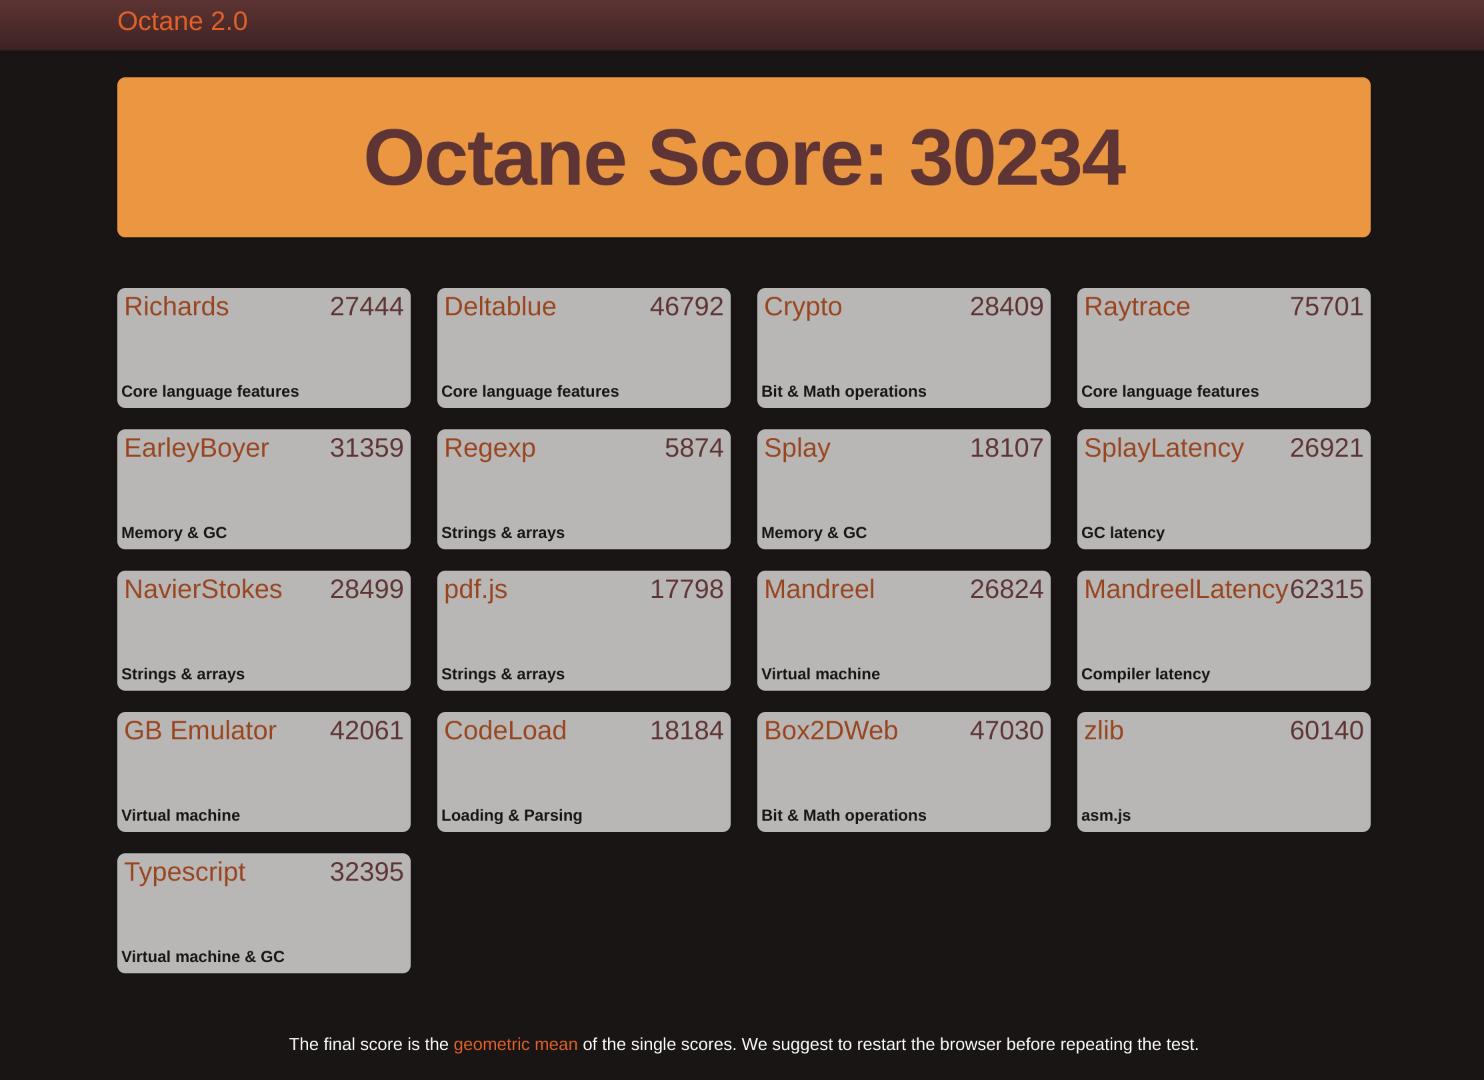 Octane 2.0スコアは30234